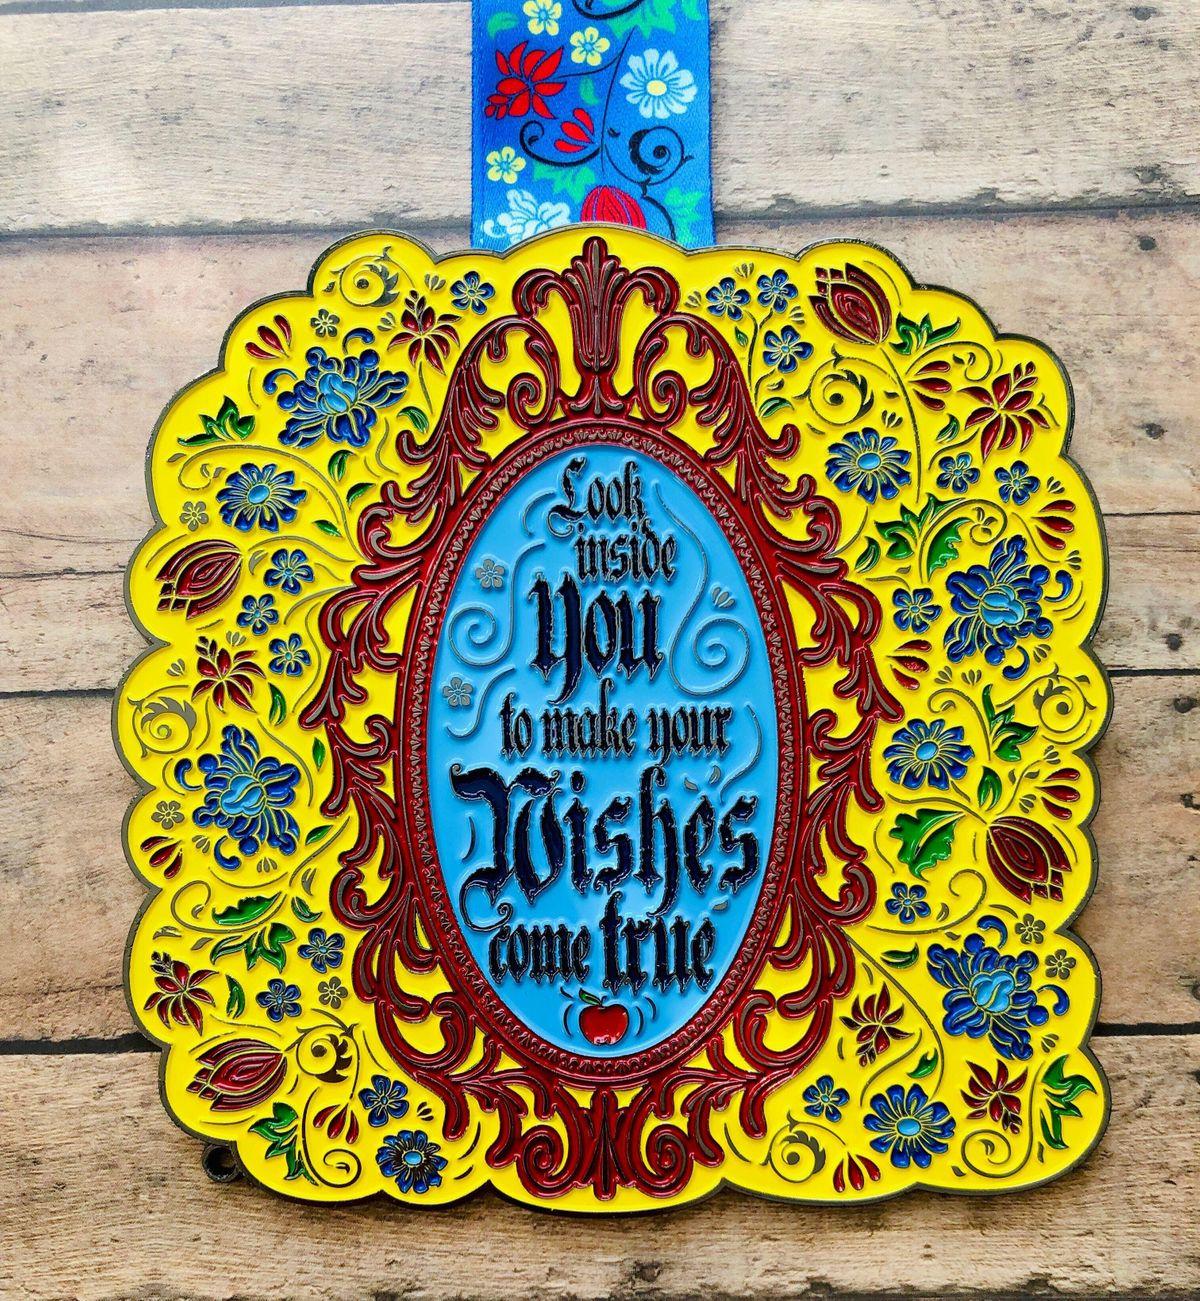 Wishes Come True 1M 5K 10K 13.1 26.2 - San Francisco